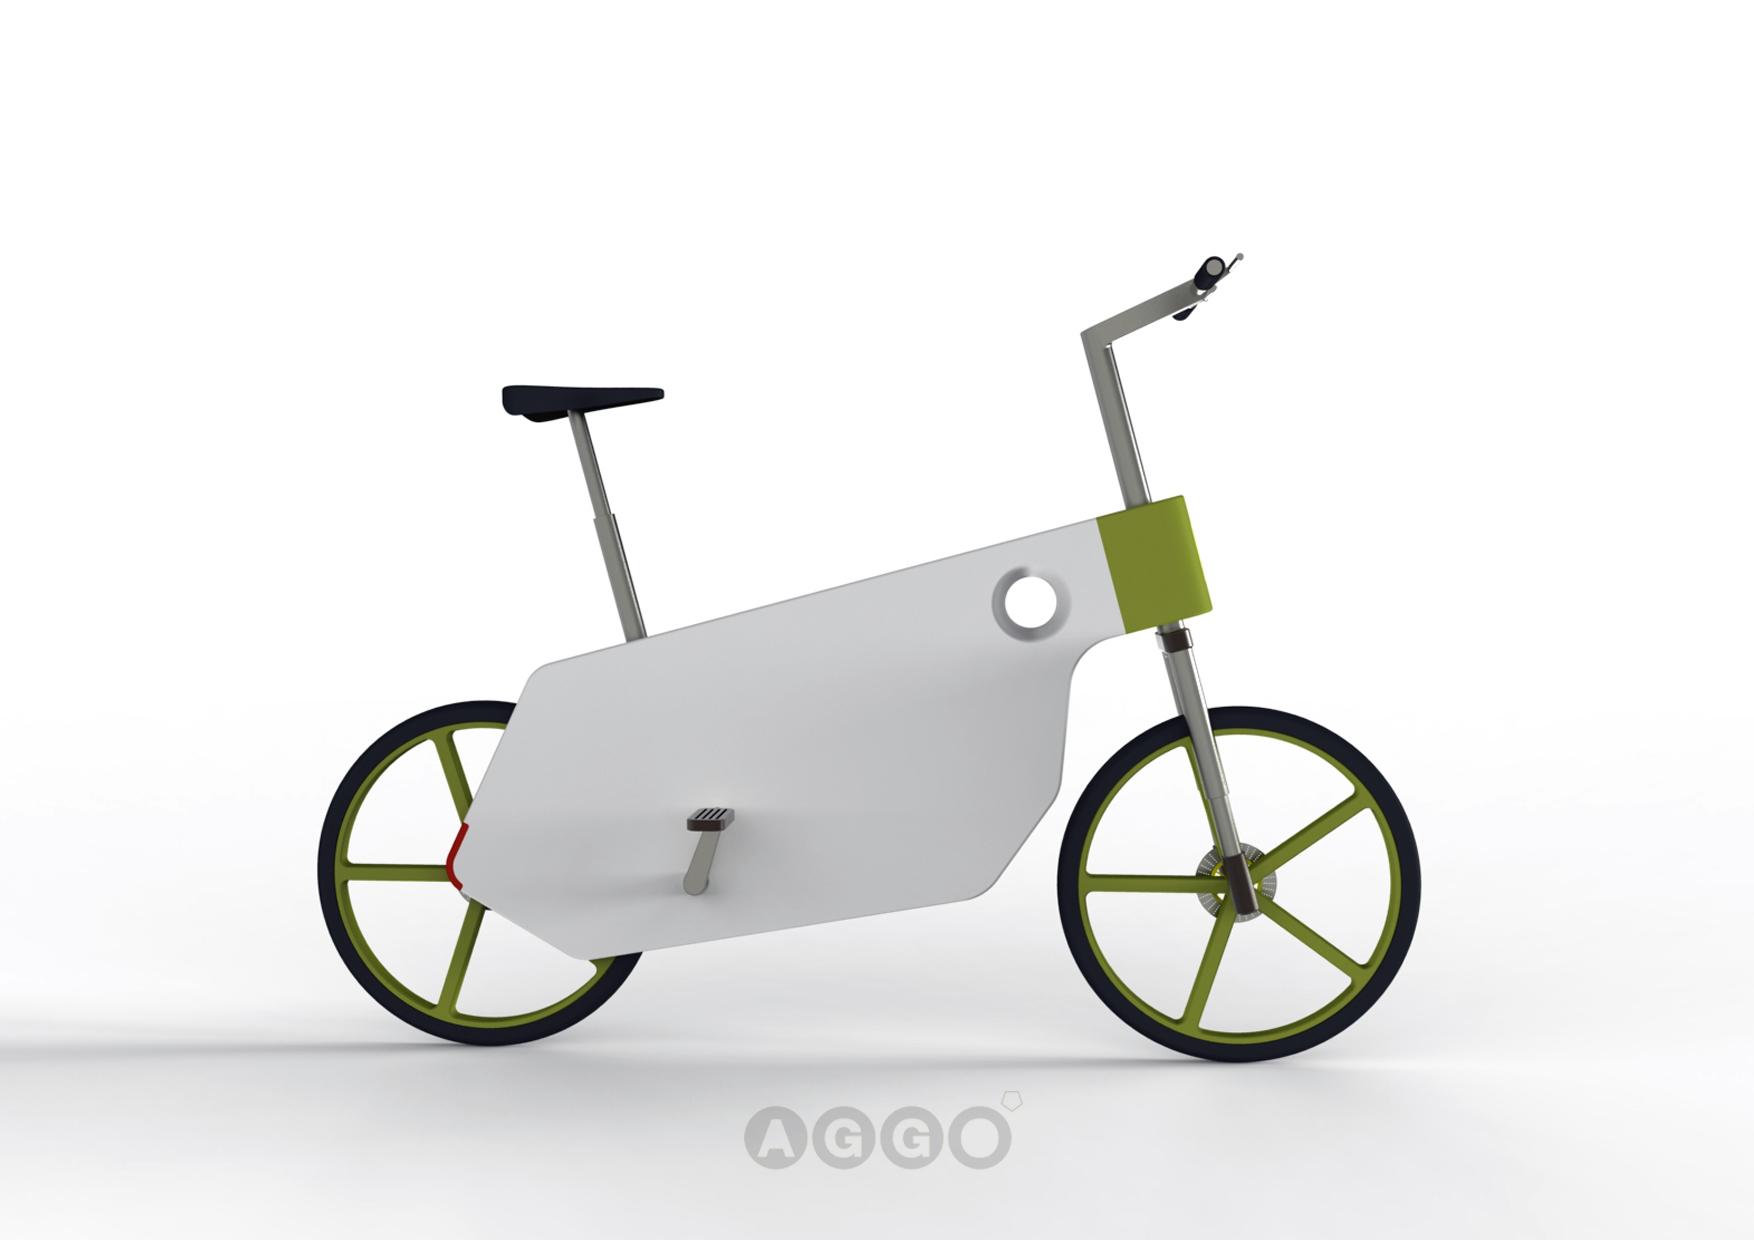 aggo_tesla_bike000.jpg